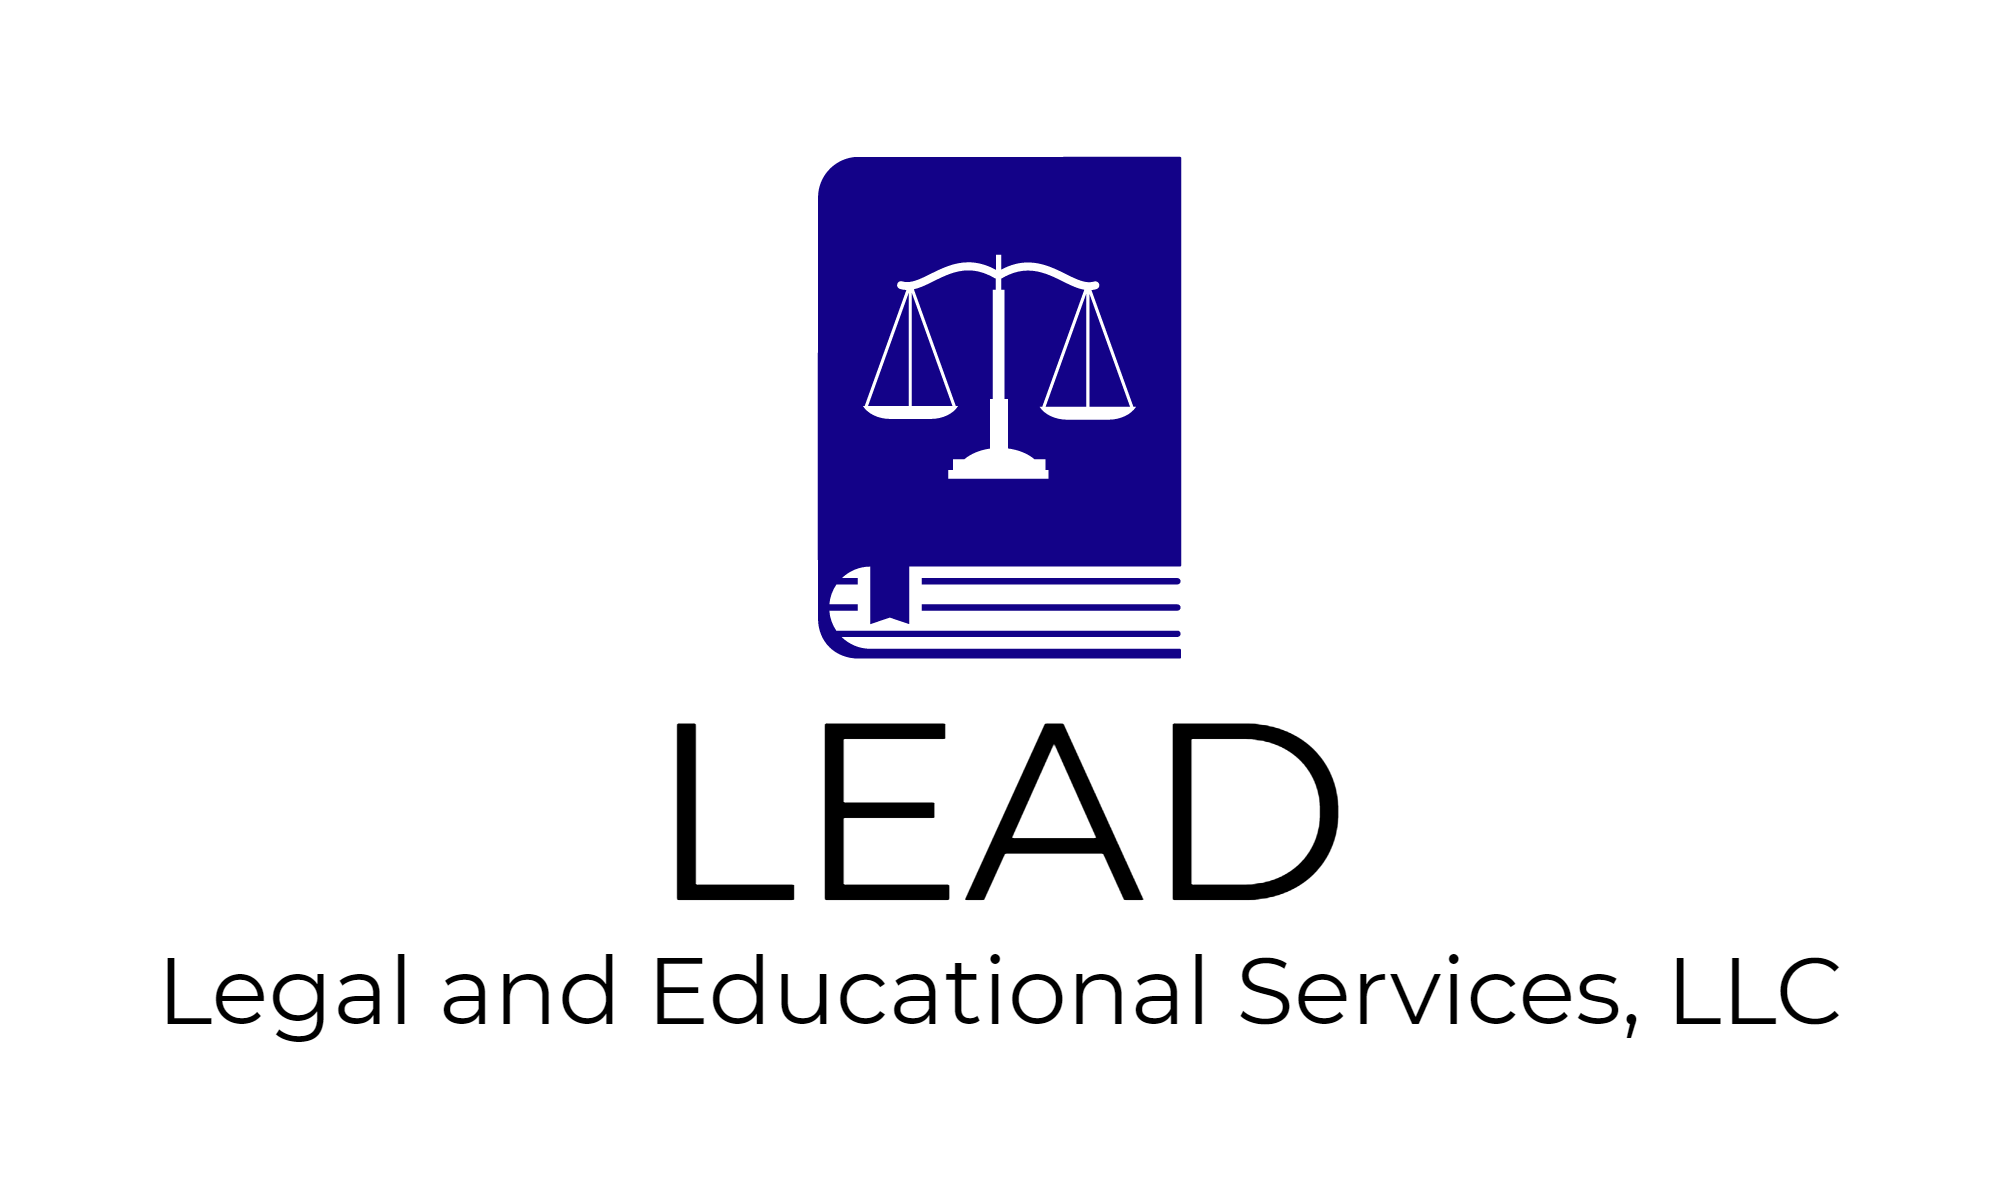 LEAD-logo (2) (1).png